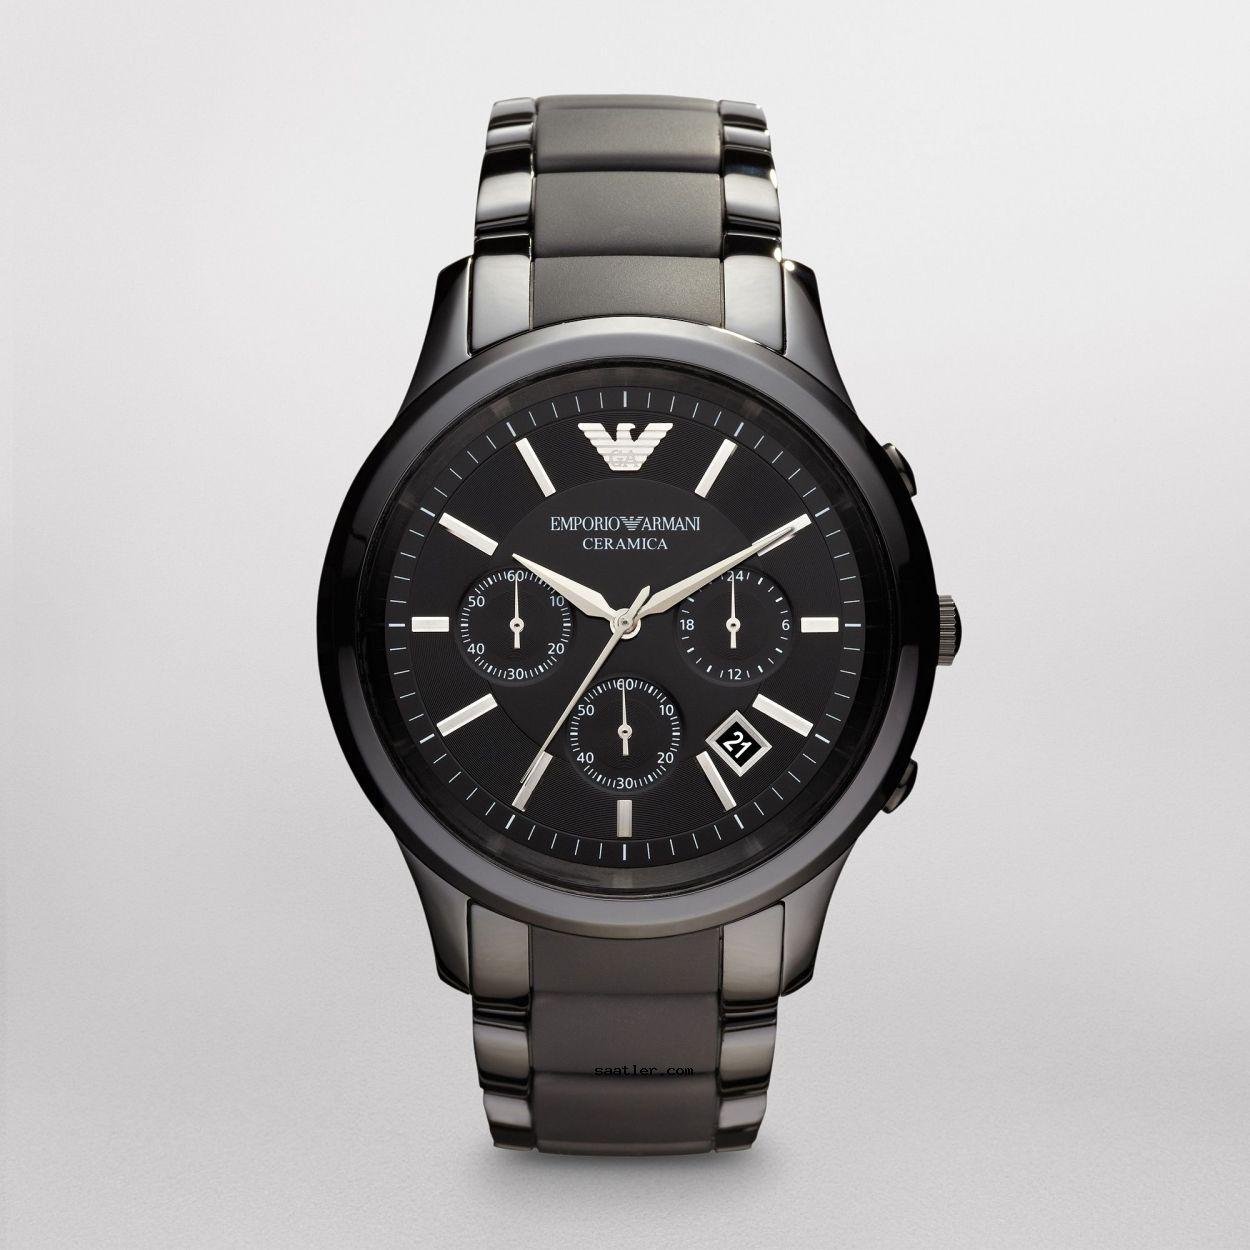 Emporio Armani Ceramica Ar1452 Siyah Erkek Kol Saati Emporio Armani Mens Watches Armani Watches For Men Mens Fashion Watches